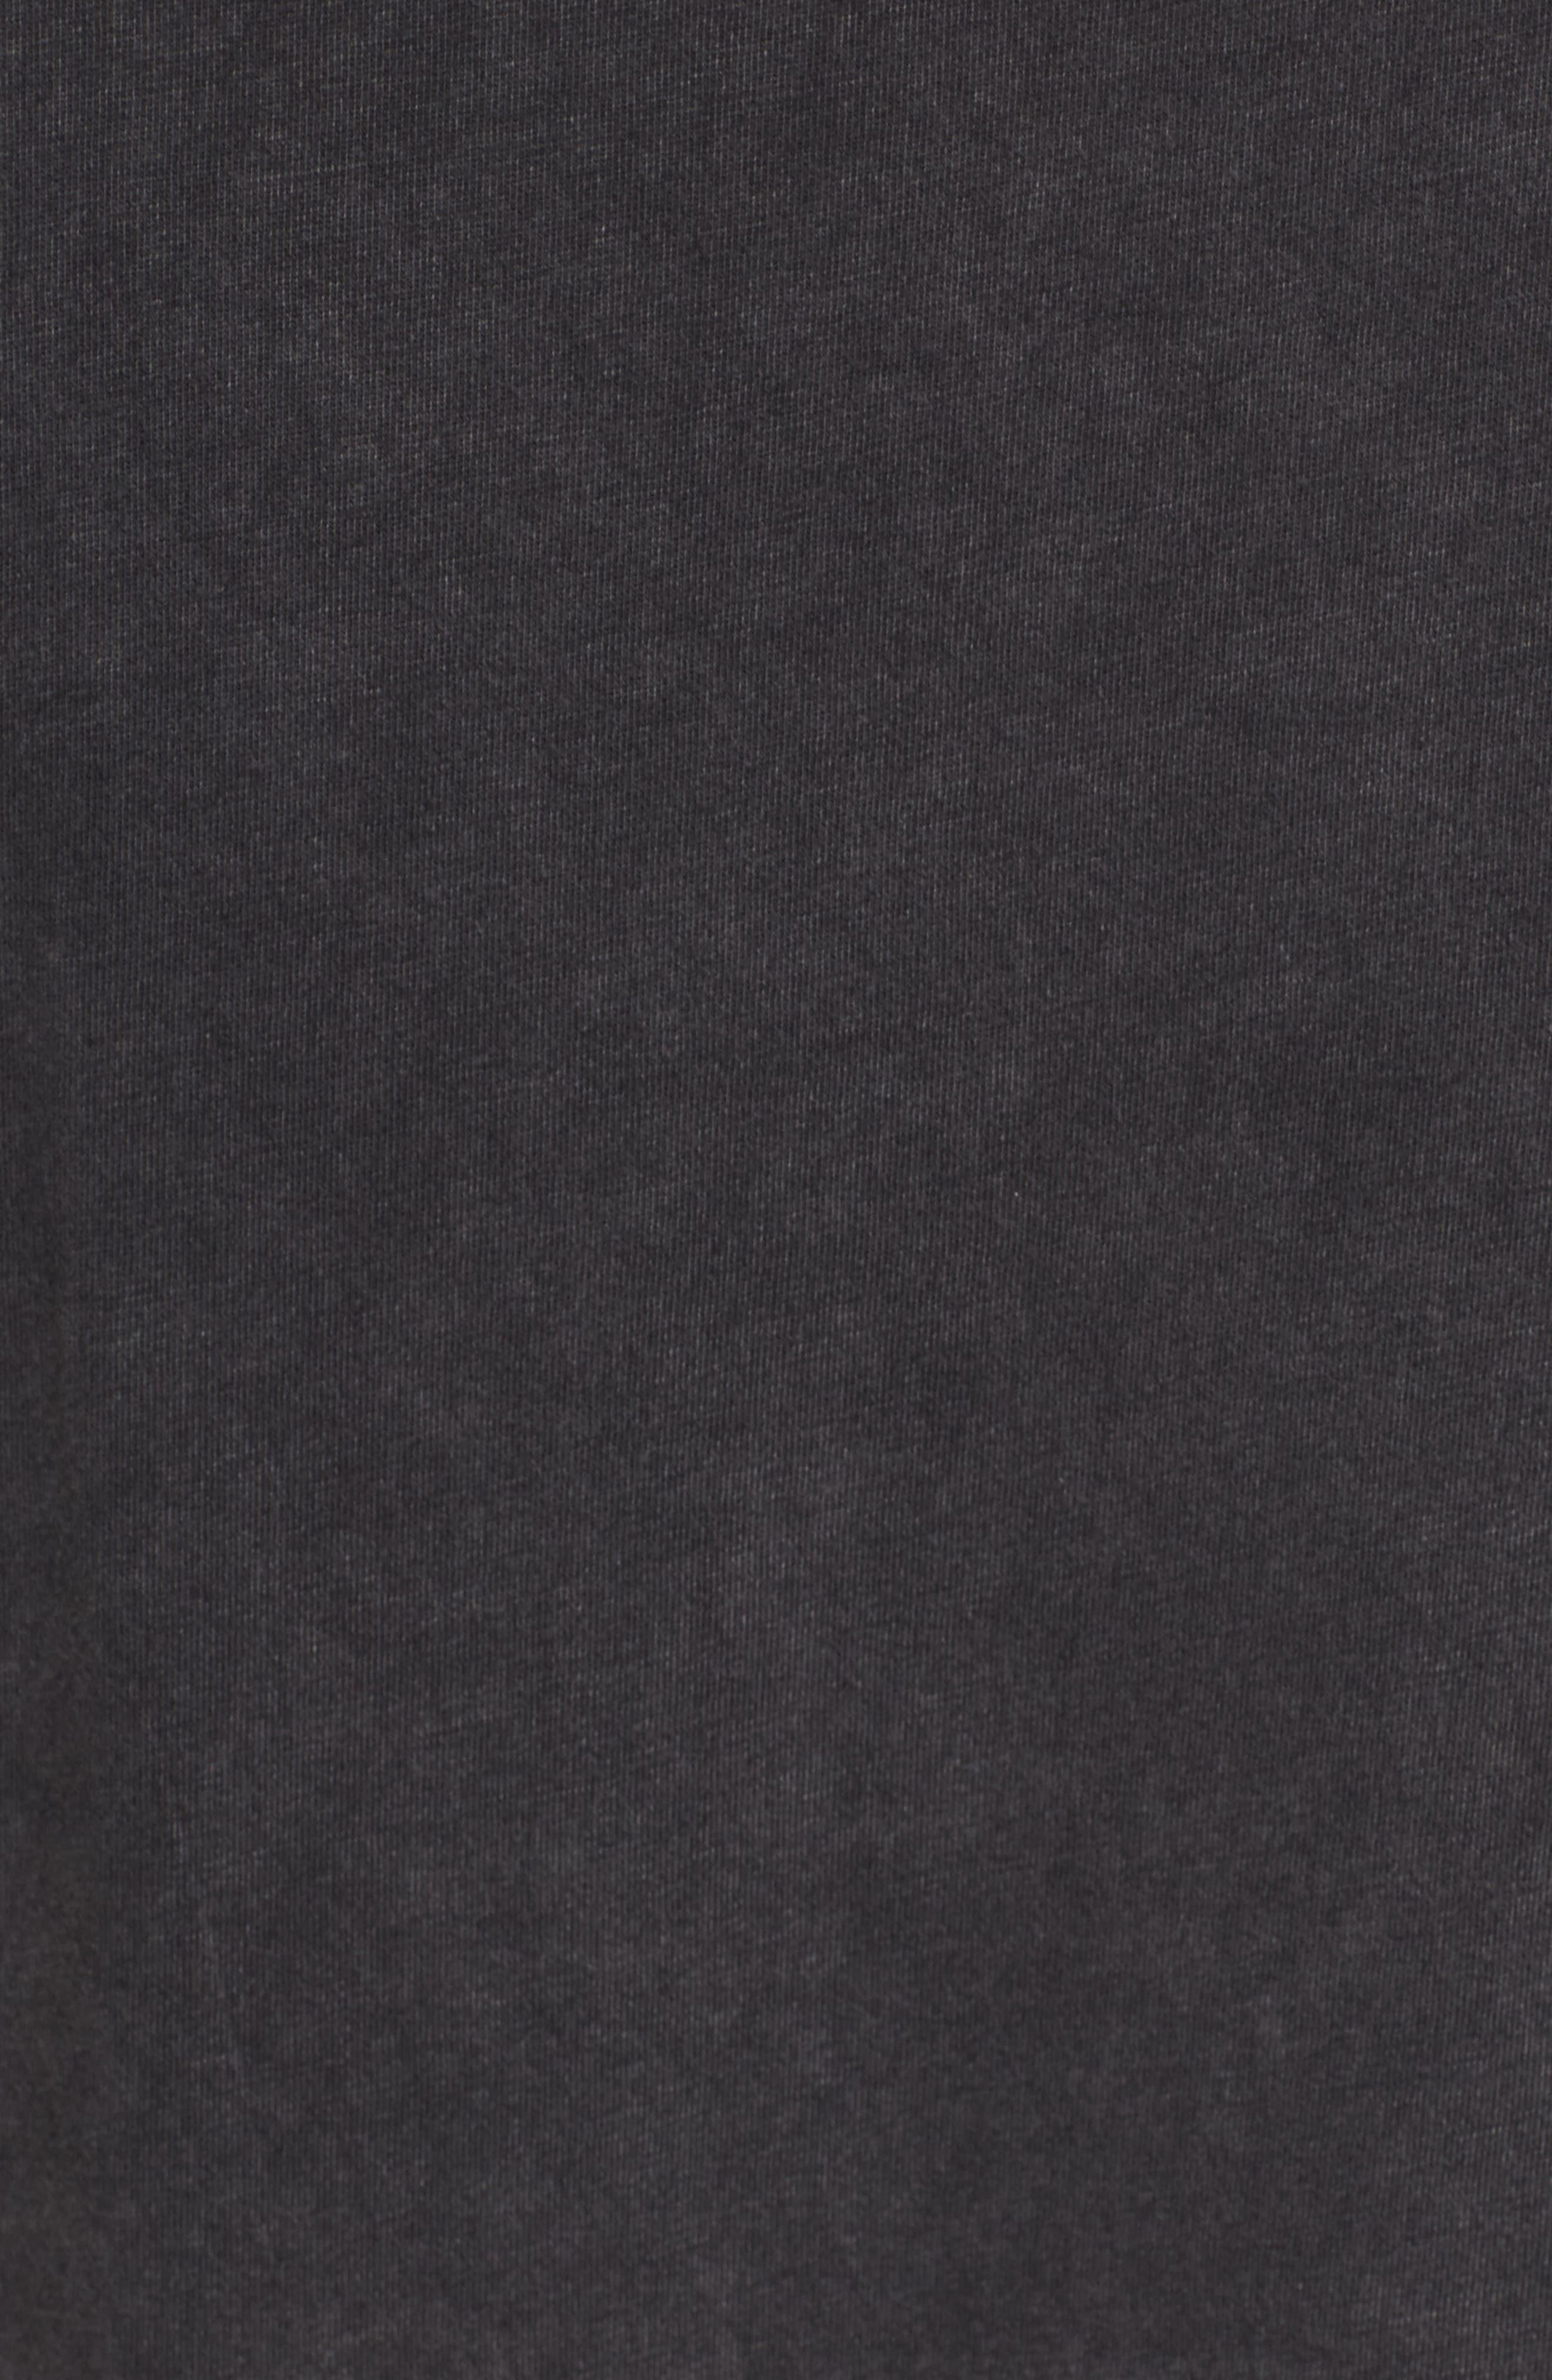 Dizzy Tour T-Shirt,                             Alternate thumbnail 5, color,                             Black